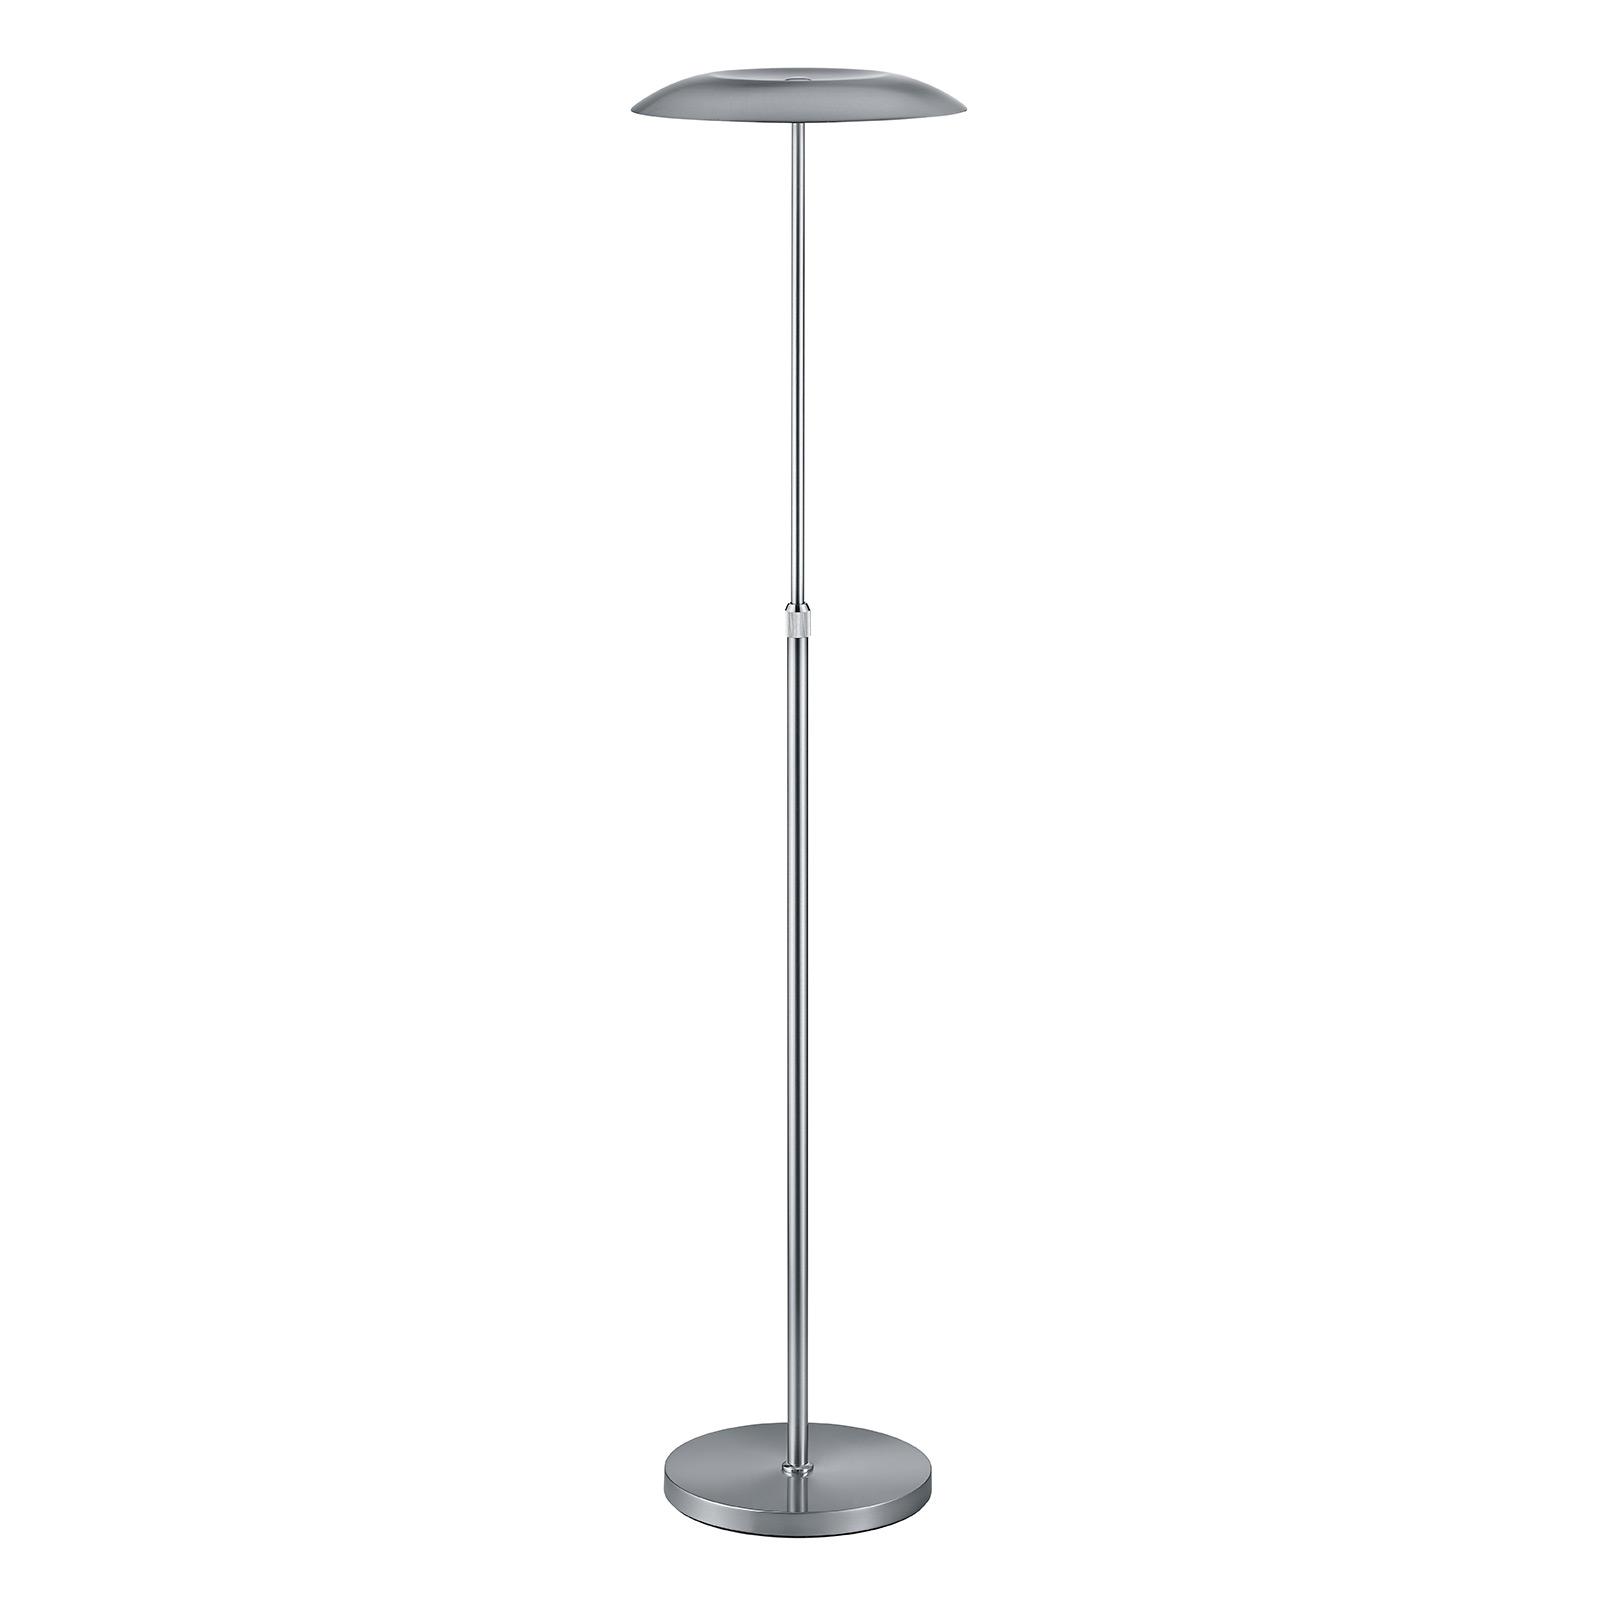 B-Leuchten Curling lampa stojąca LED nikiel matowa